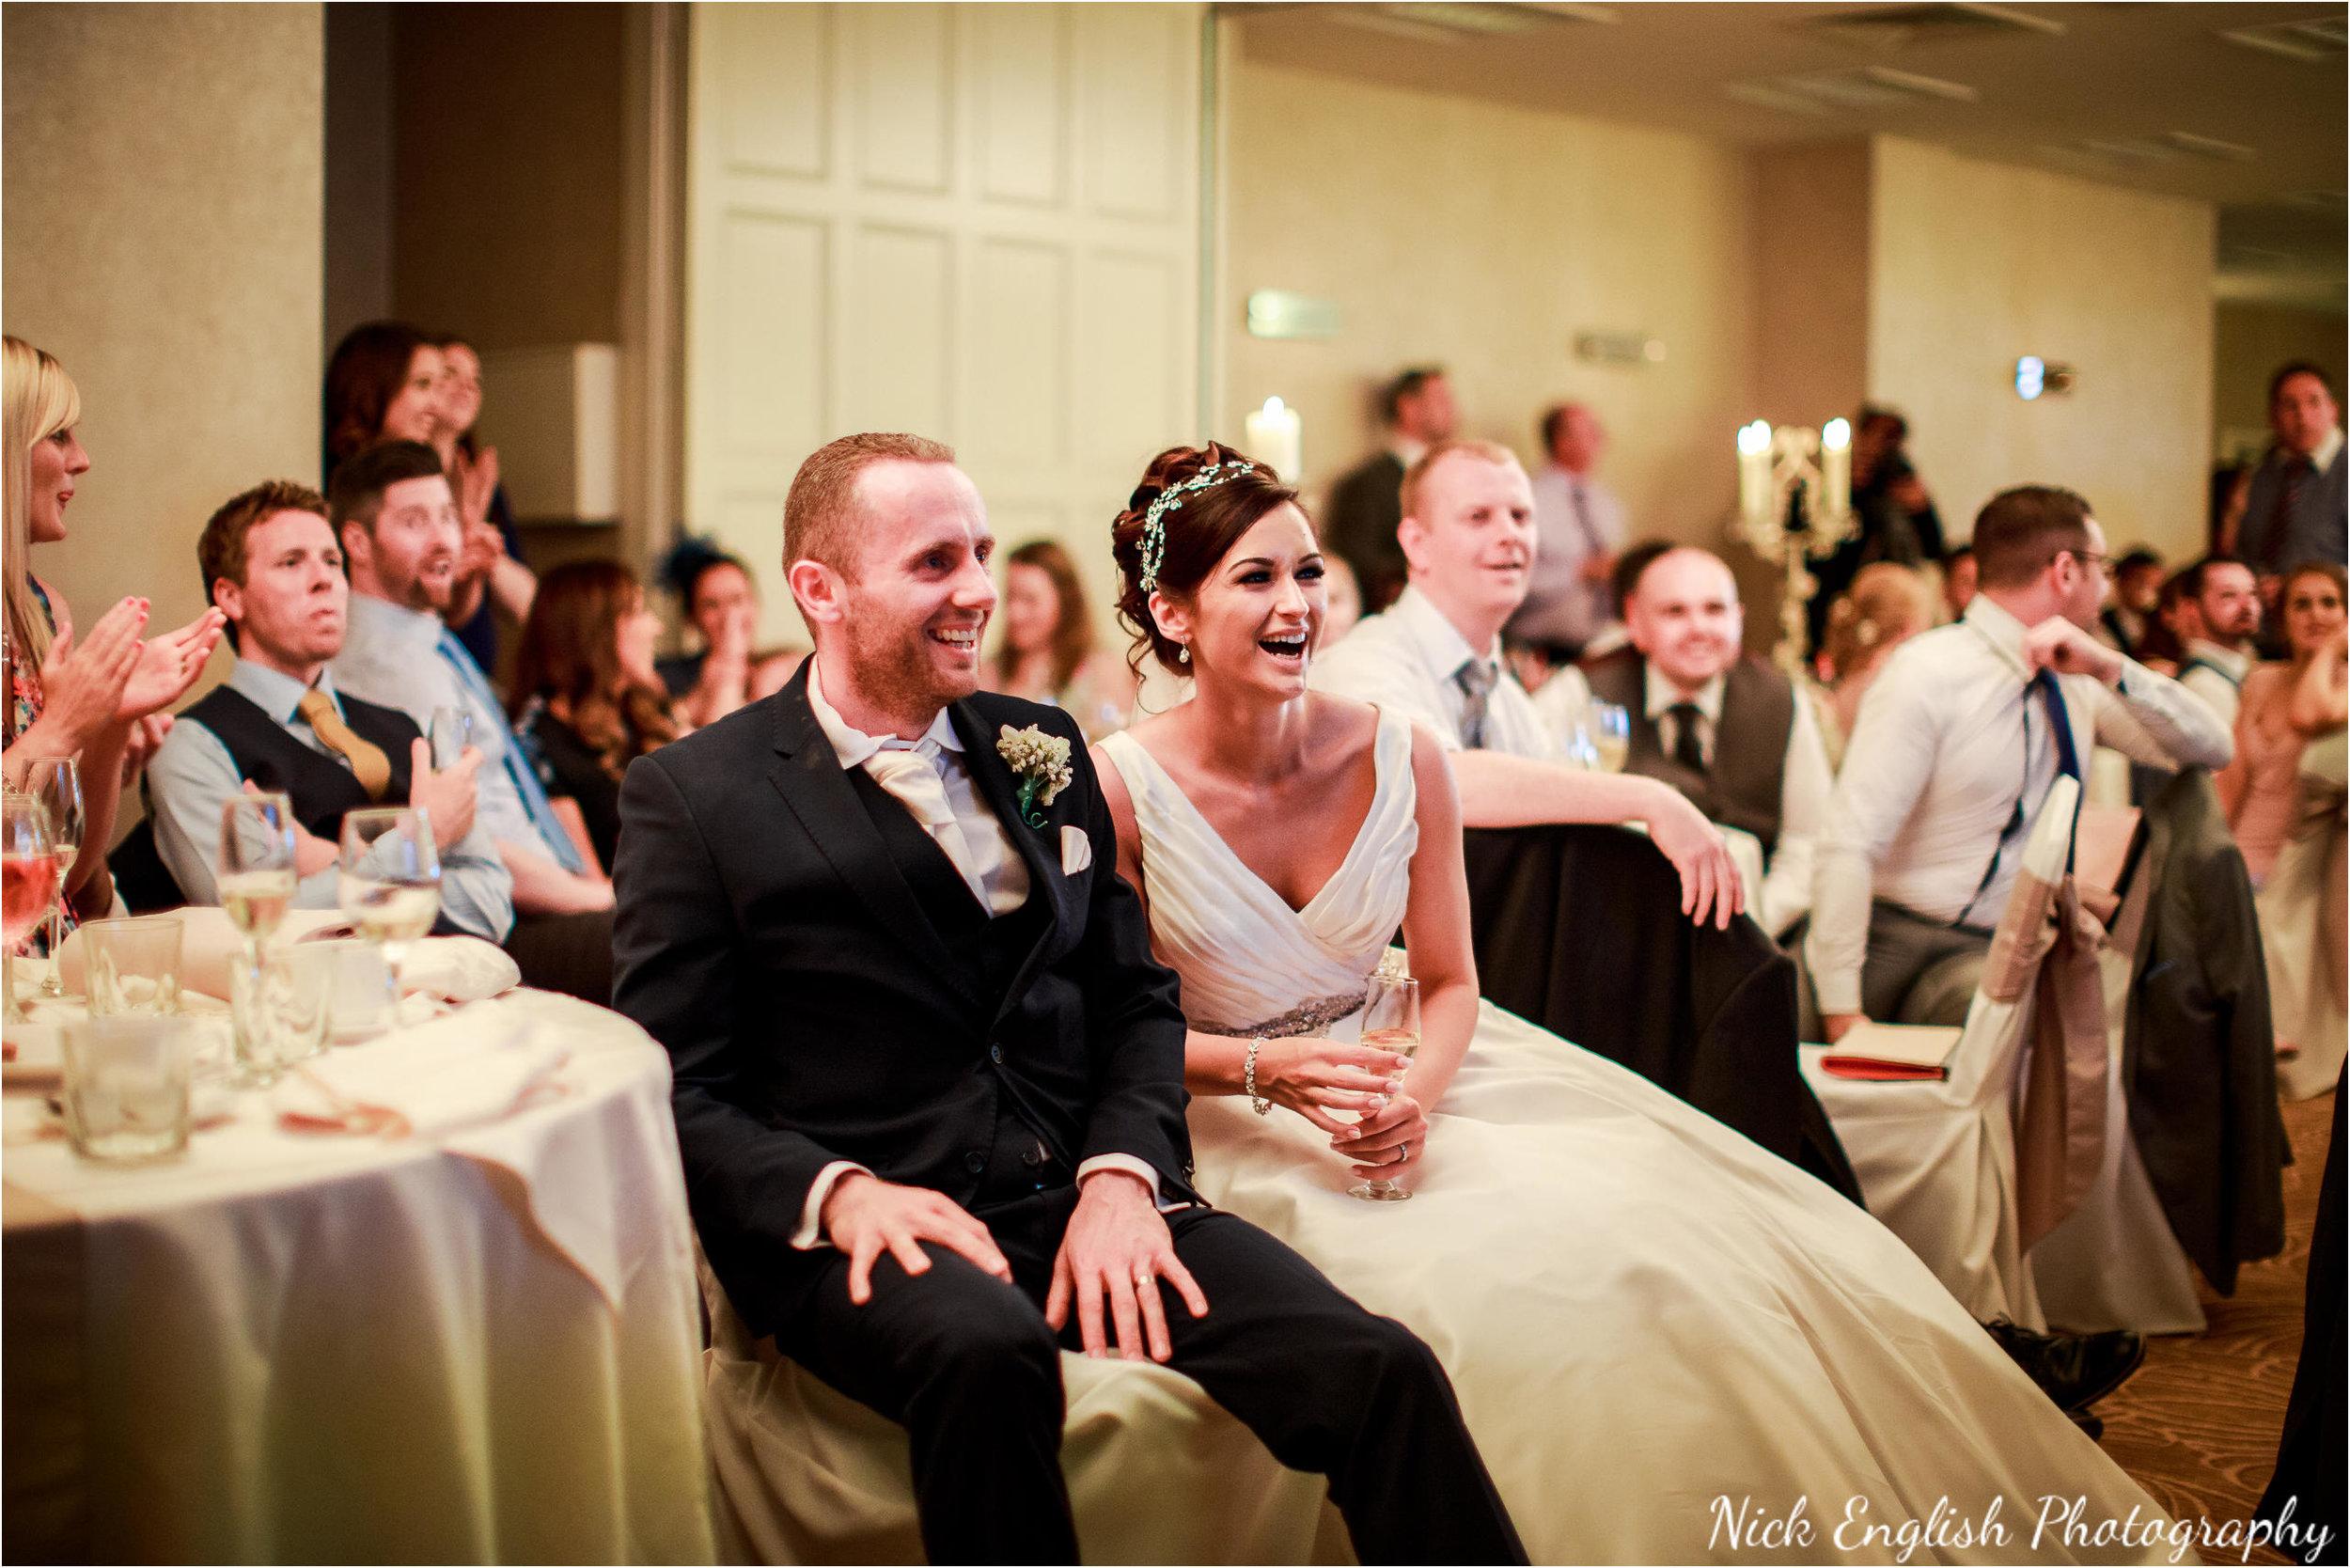 Emily David Wedding Photographs at Barton Grange Preston by Nick English Photography 181jpg.jpeg